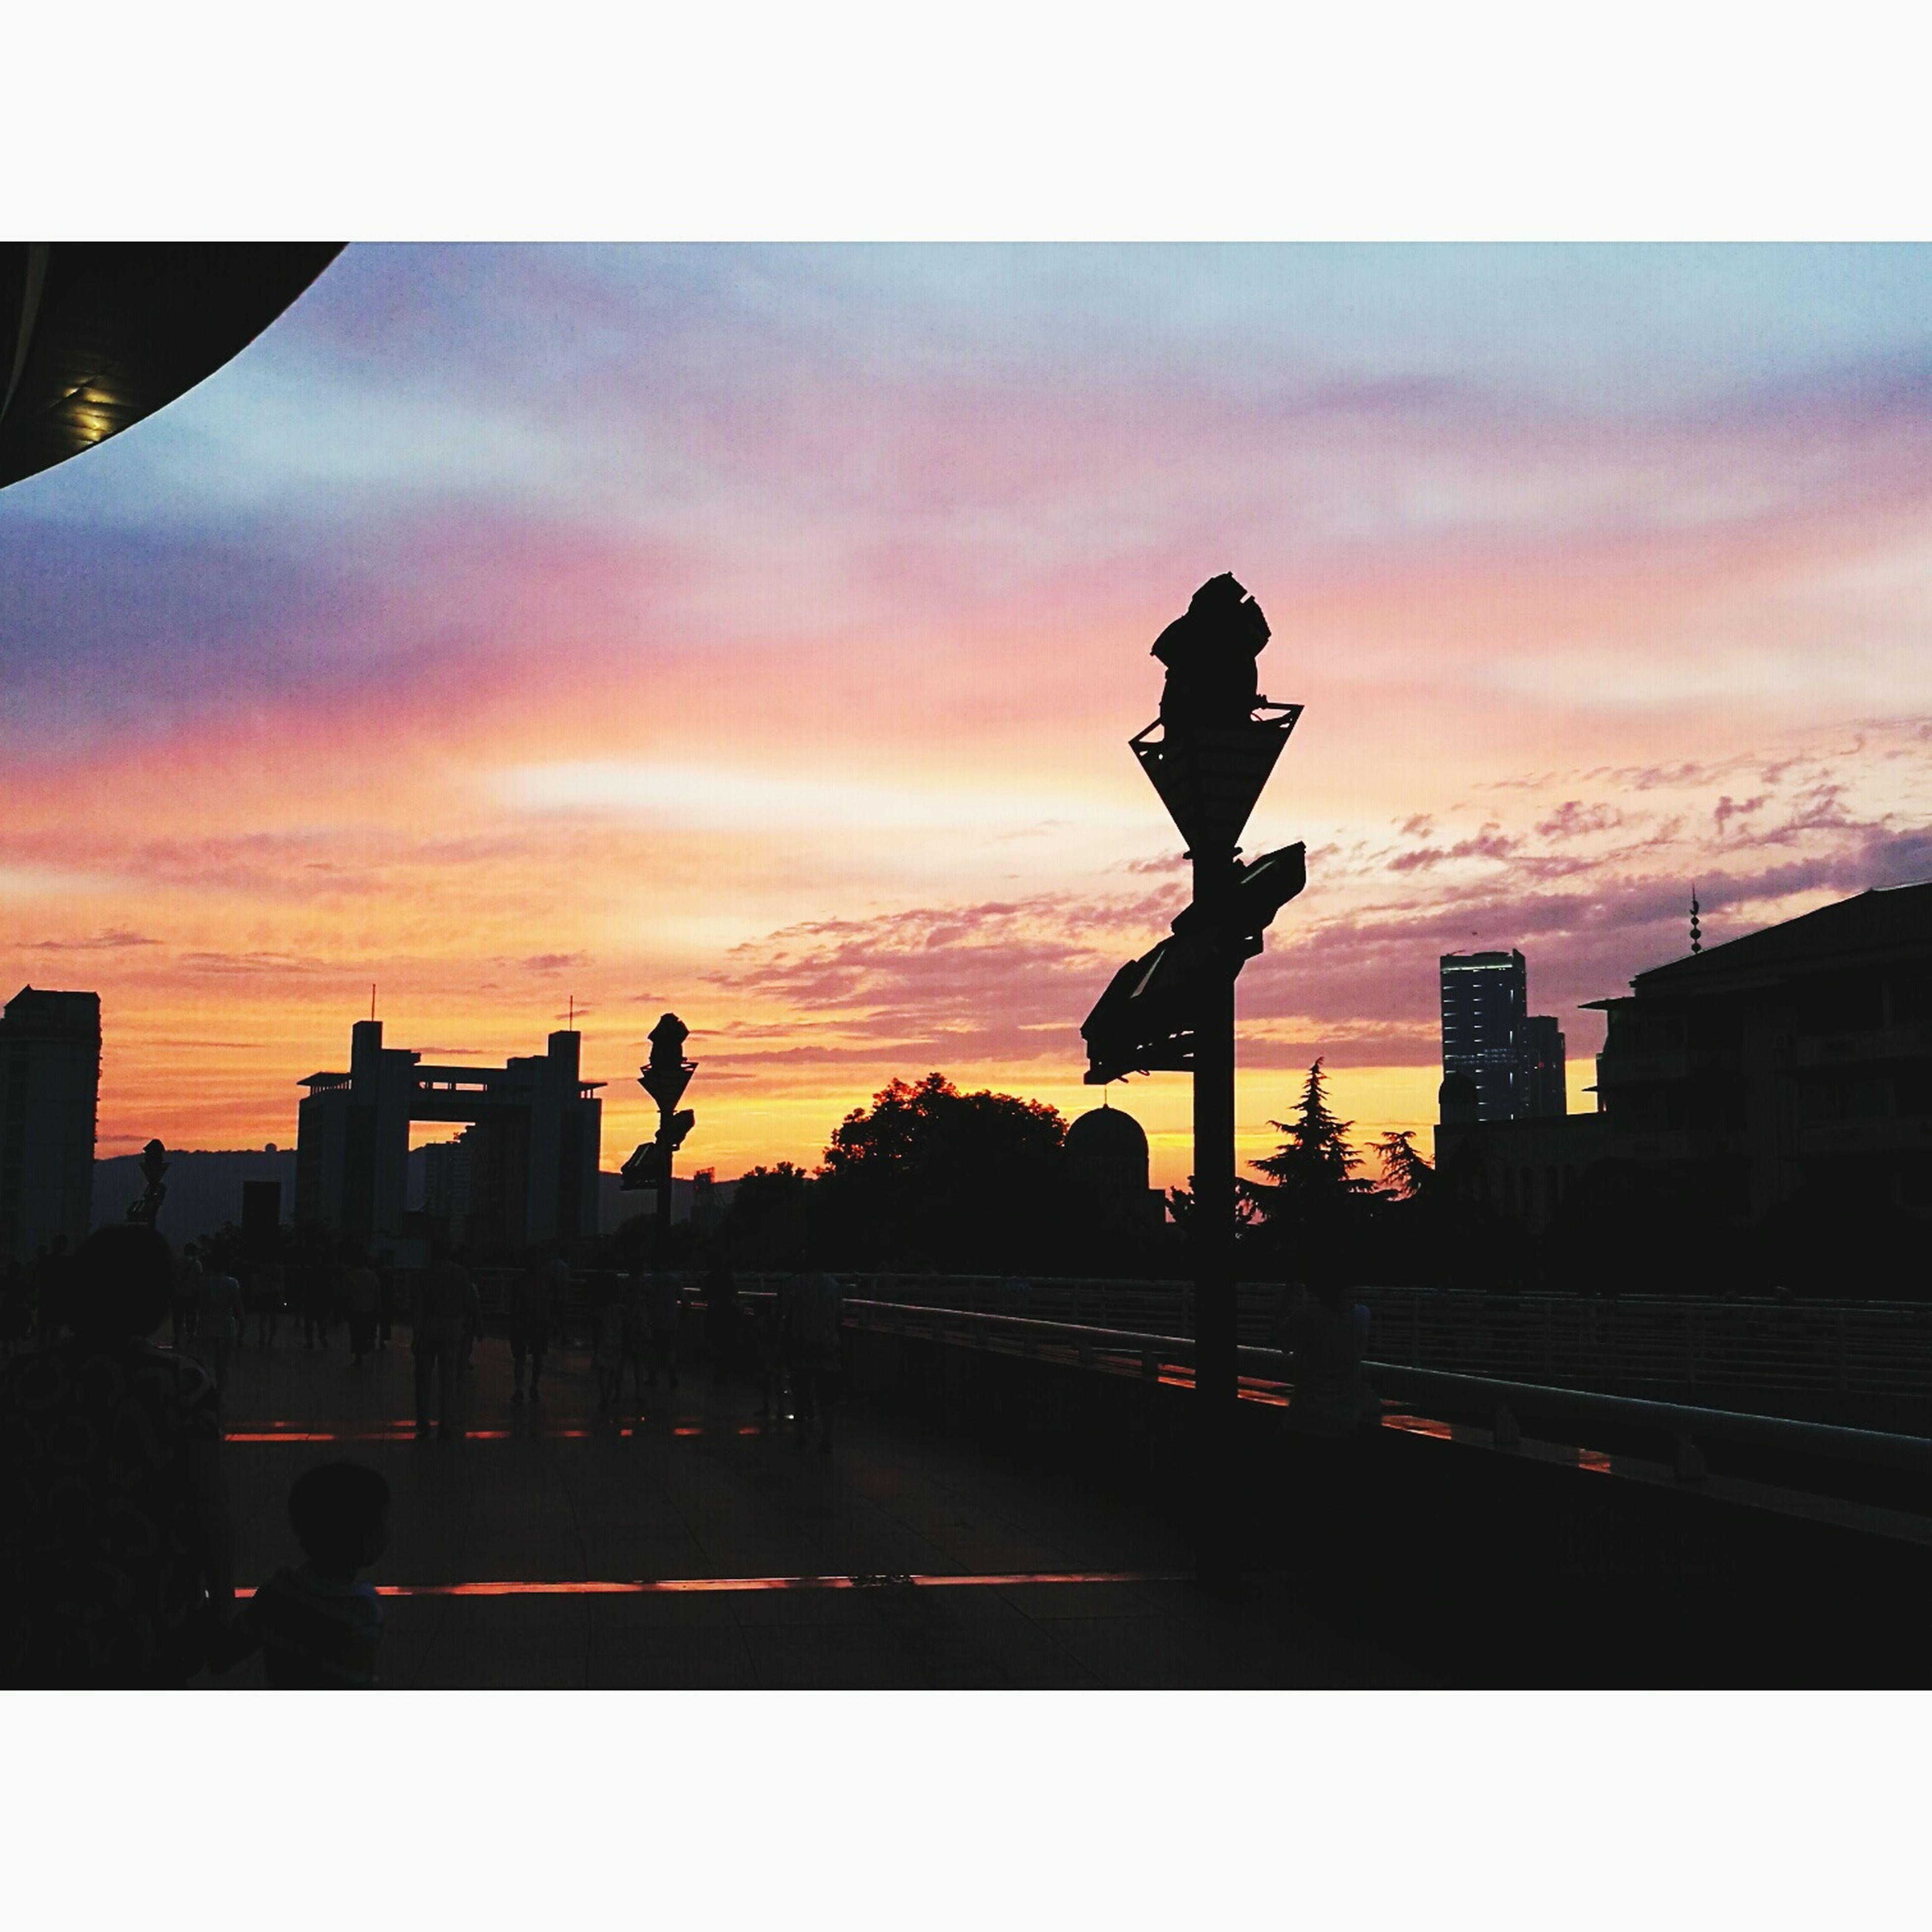 silhouette, sunset, sky, architecture, built structure, cloud - sky, city, orange color, cloud, dusk, dramatic sky, cloudy, city life, outdoors, outline, dark, travel destinations